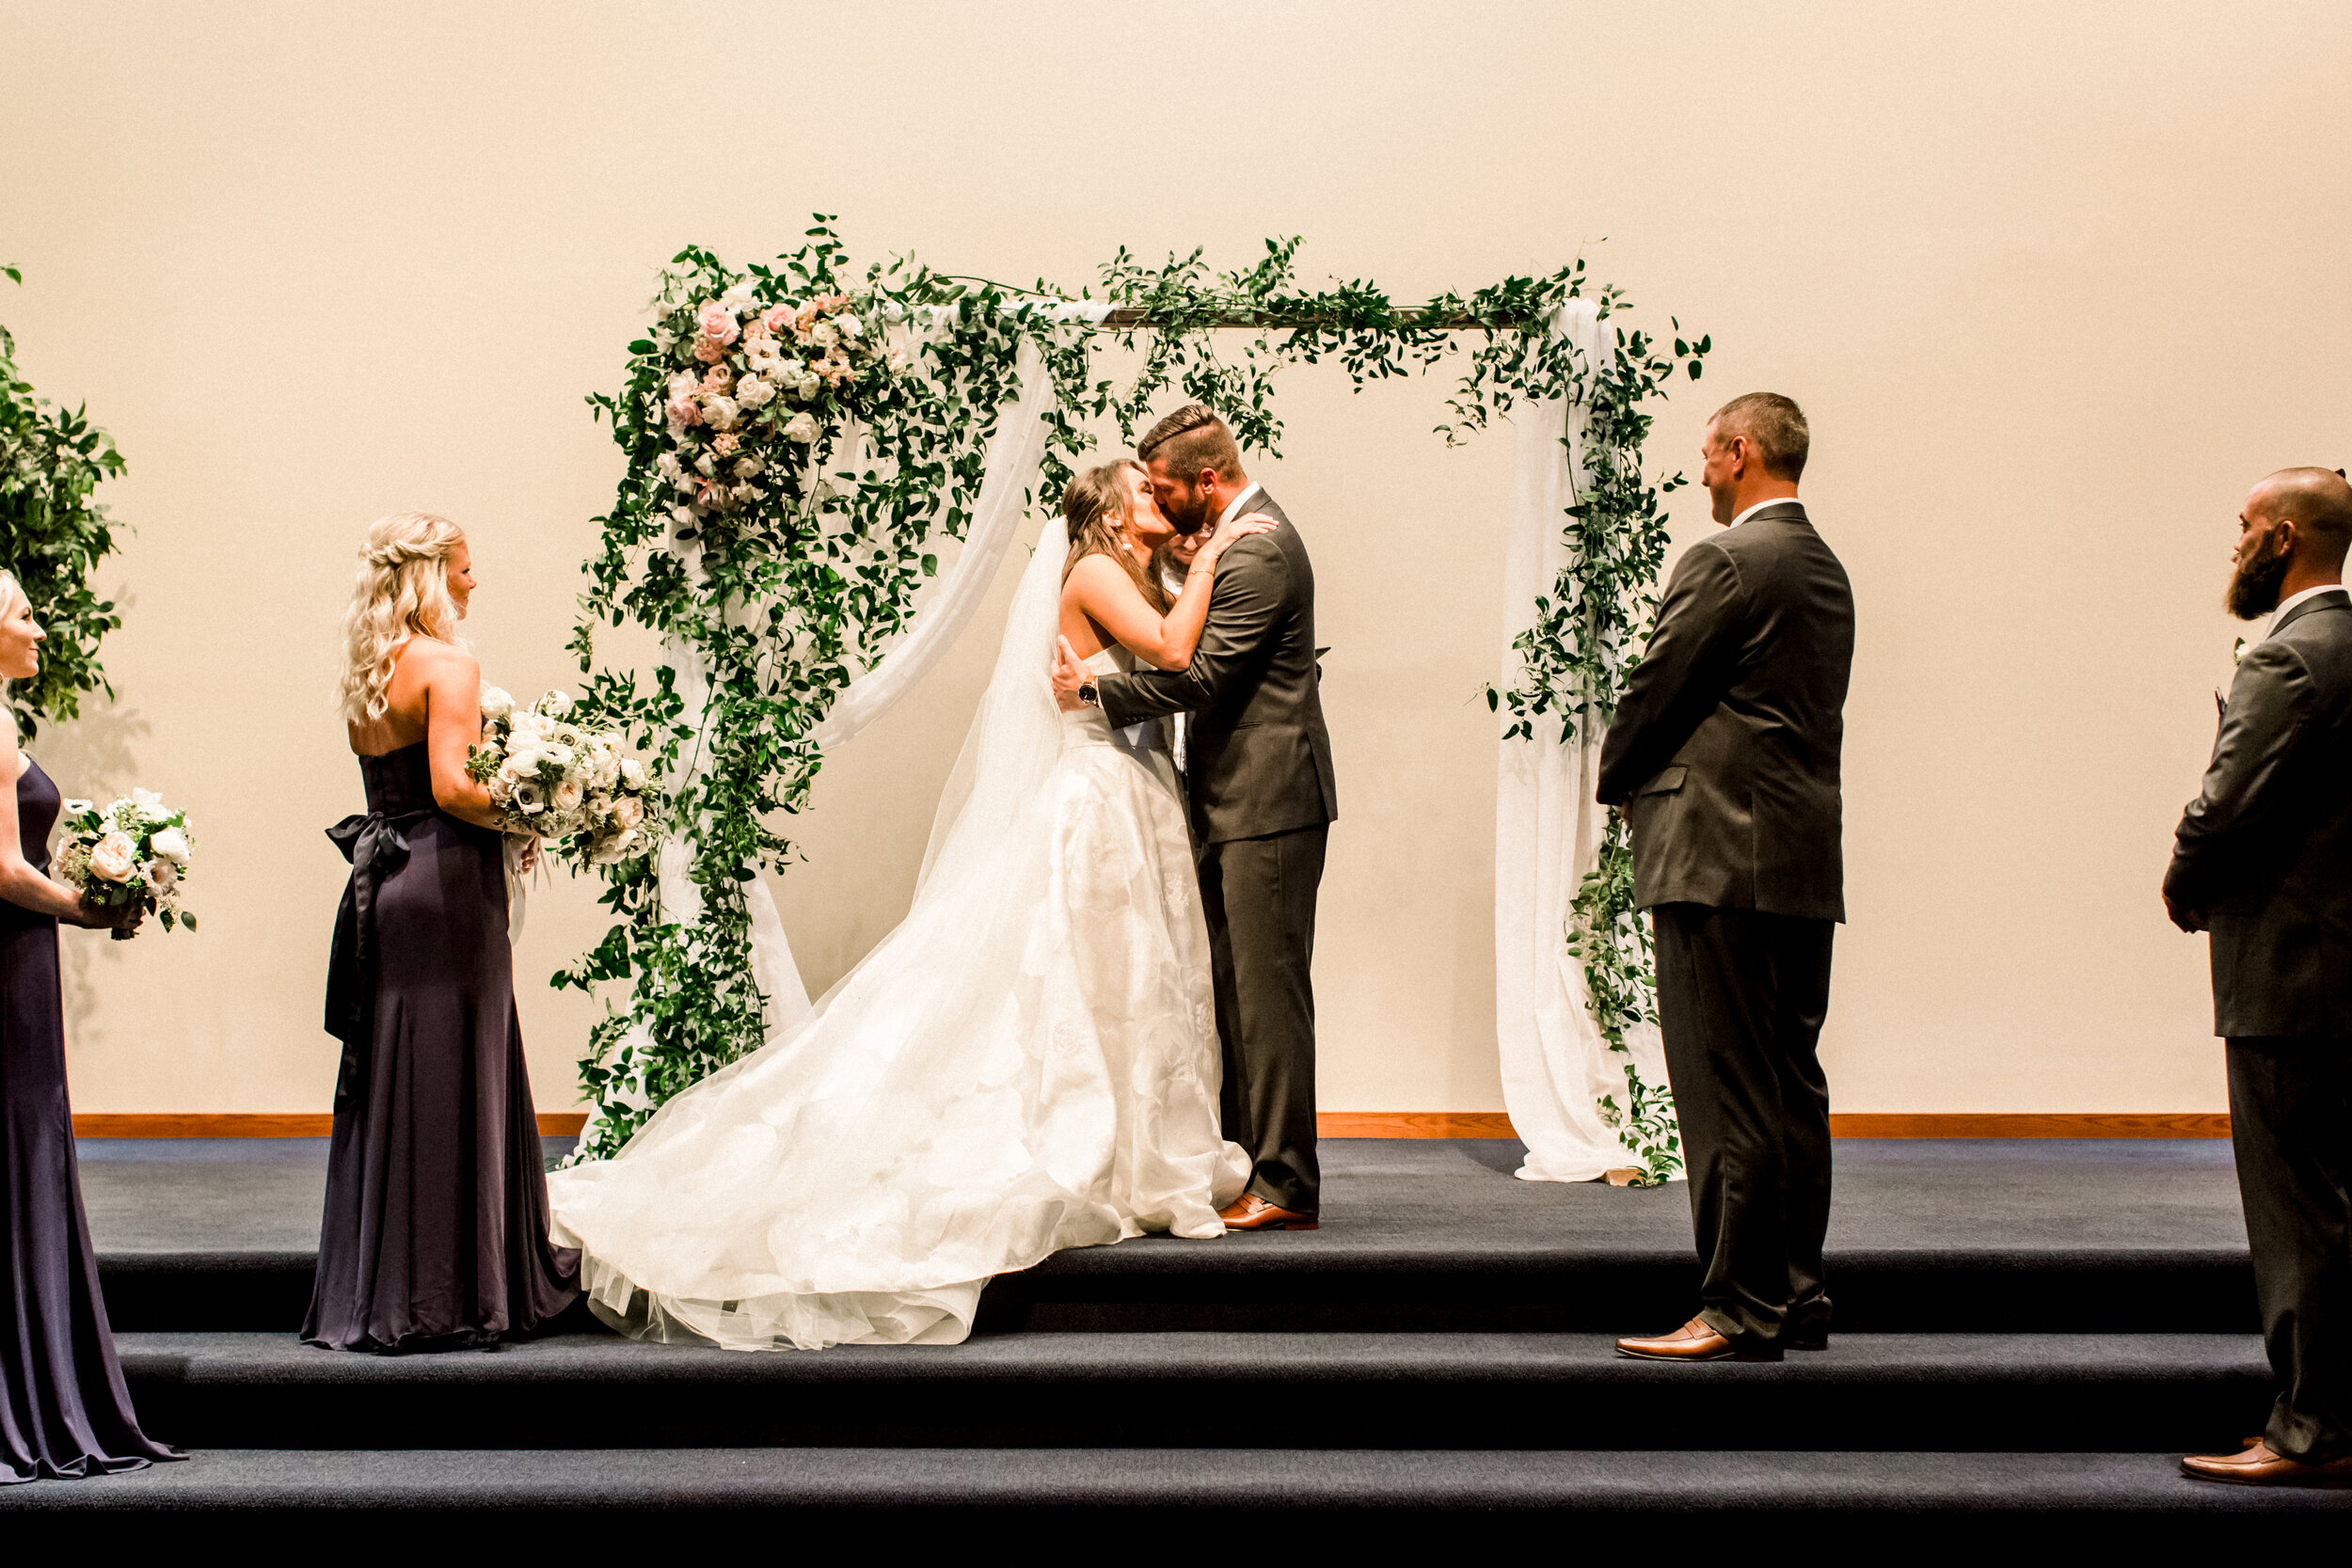 Kuiper+Wedding+Ceremony-174.jpg